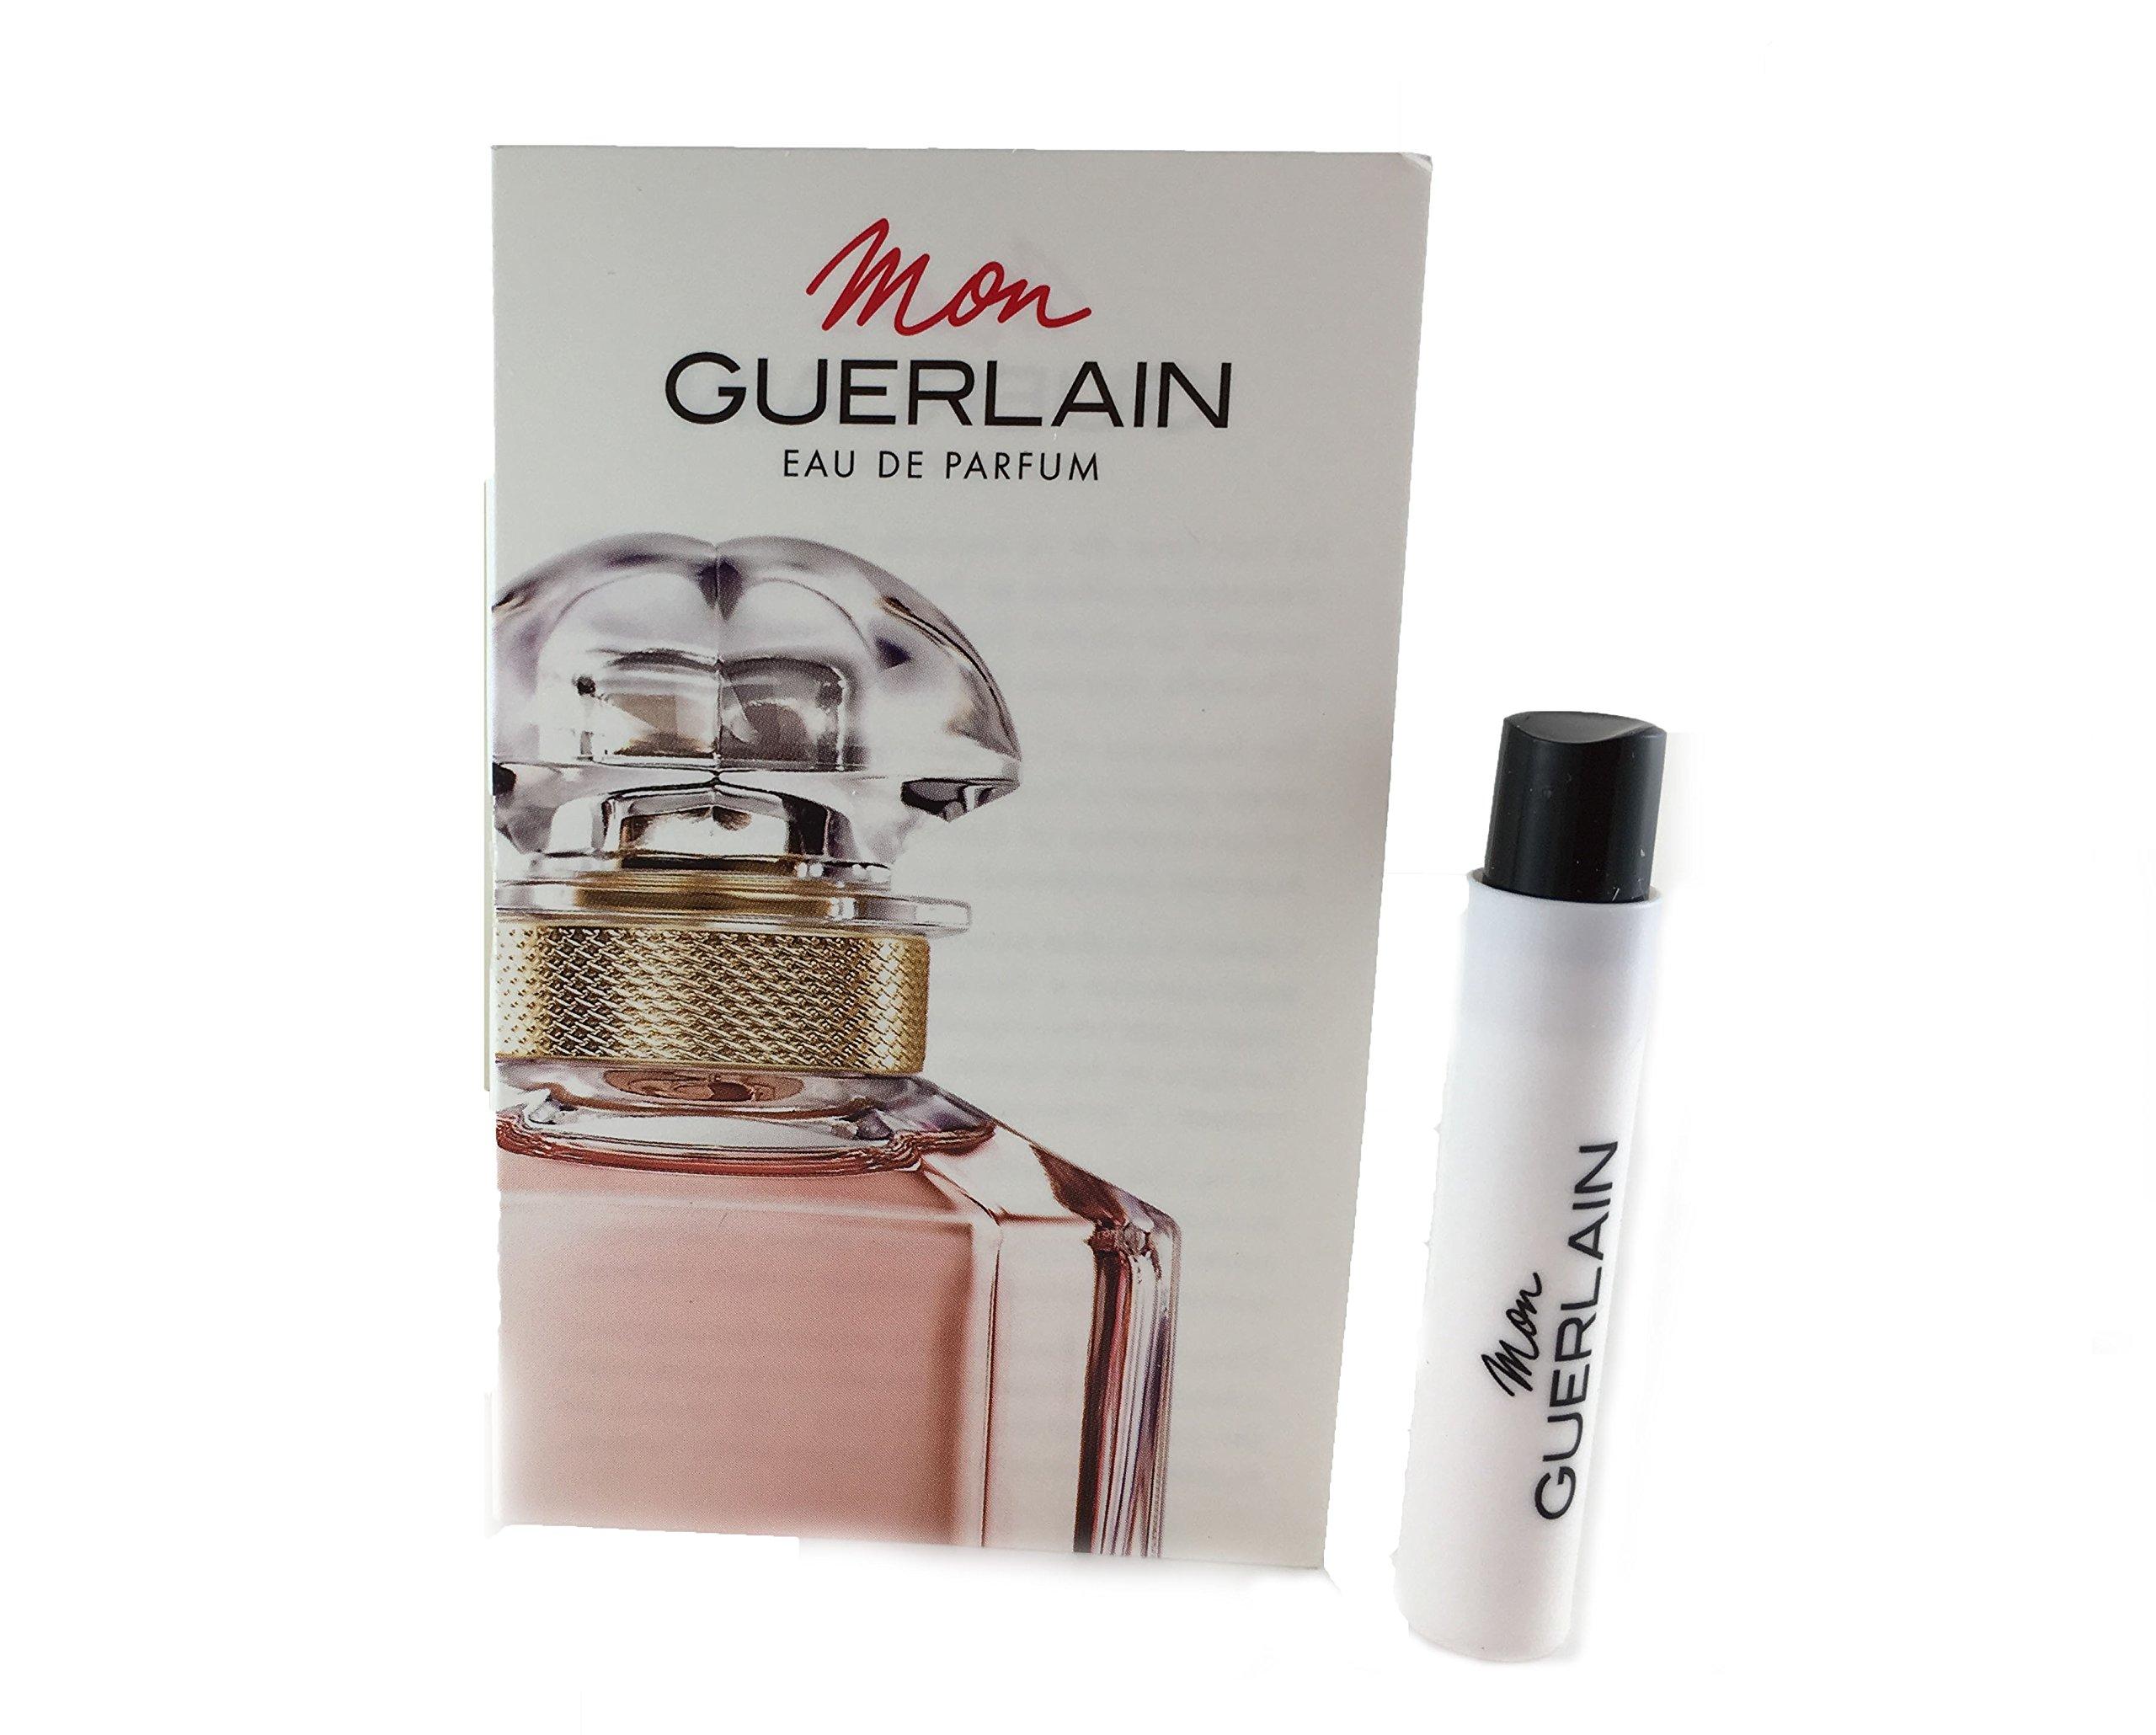 guerlain mon guerlain eau de parfum spray 100ml beauty. Black Bedroom Furniture Sets. Home Design Ideas